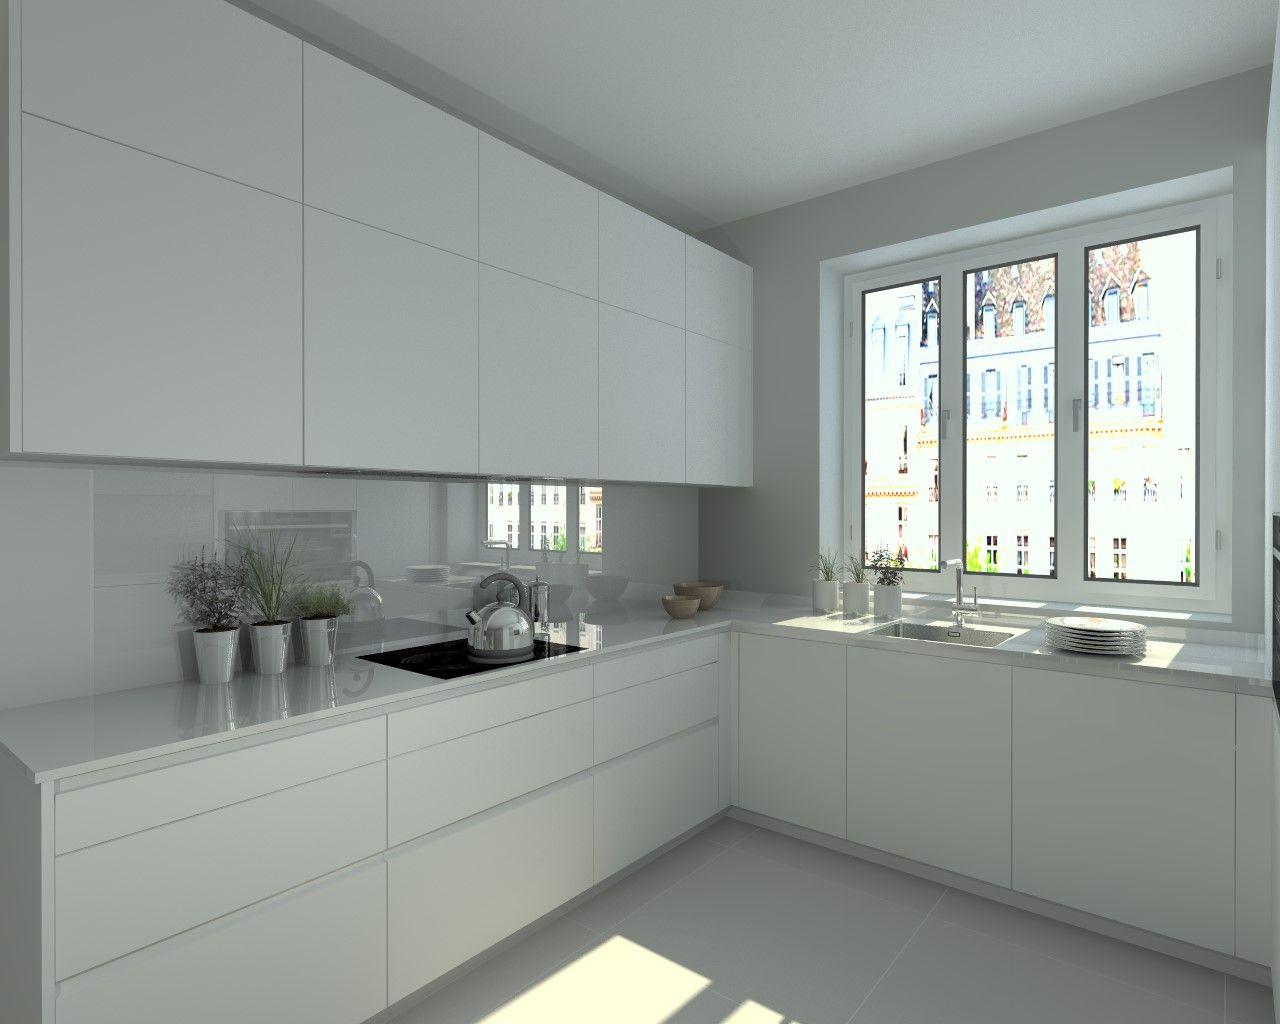 Modelo line e blanco encimera granito cocinas - Encimera granito blanco ...